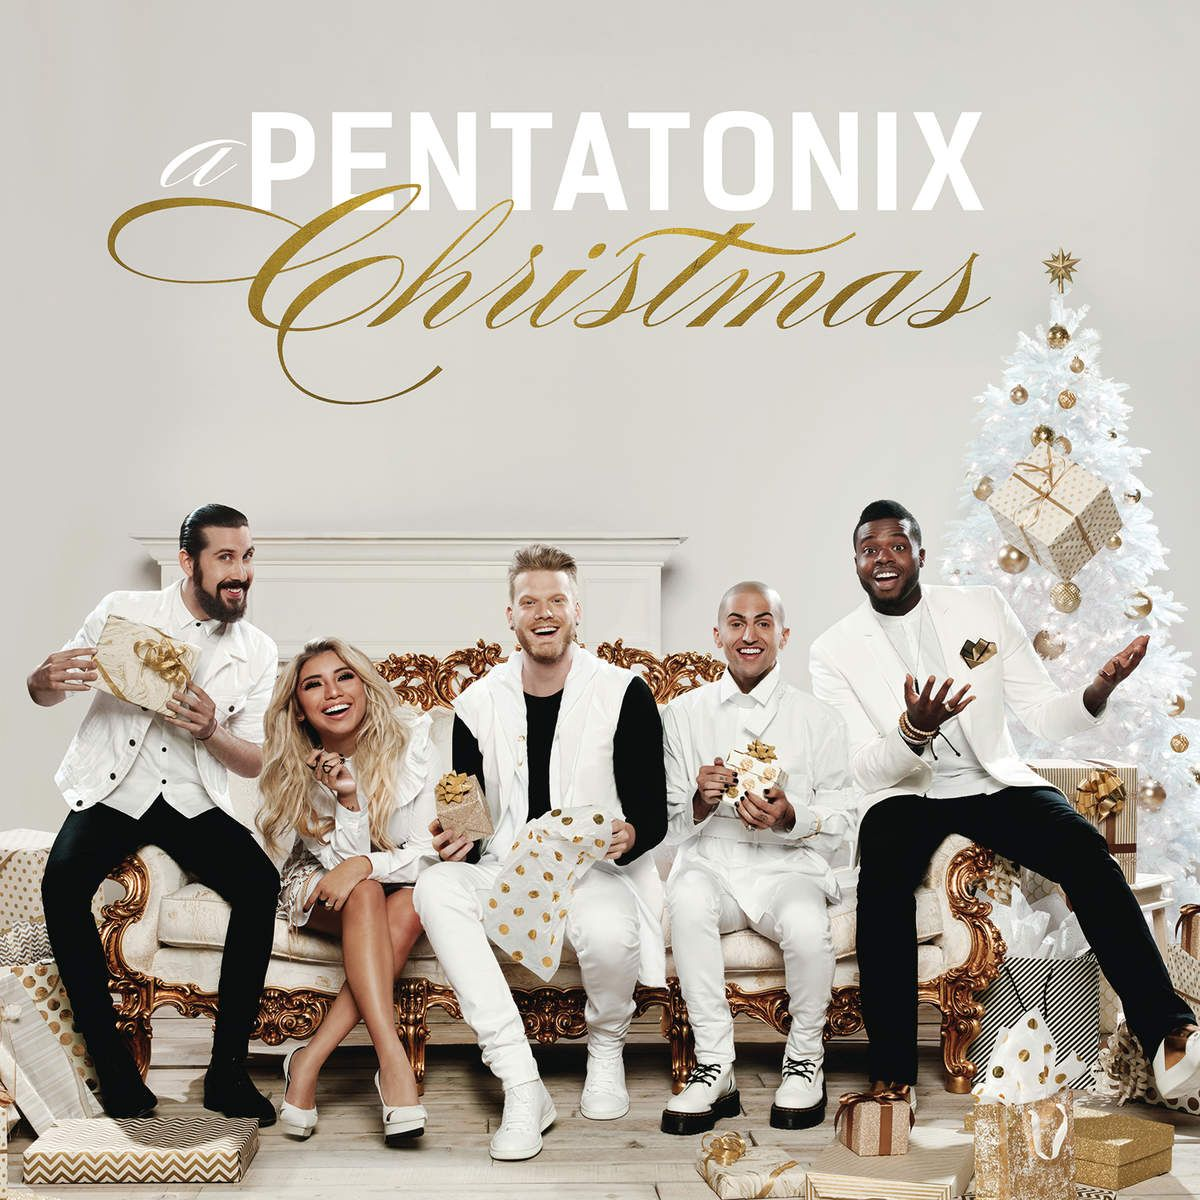 Pentatonix - A Pentatonix Christmas album cover